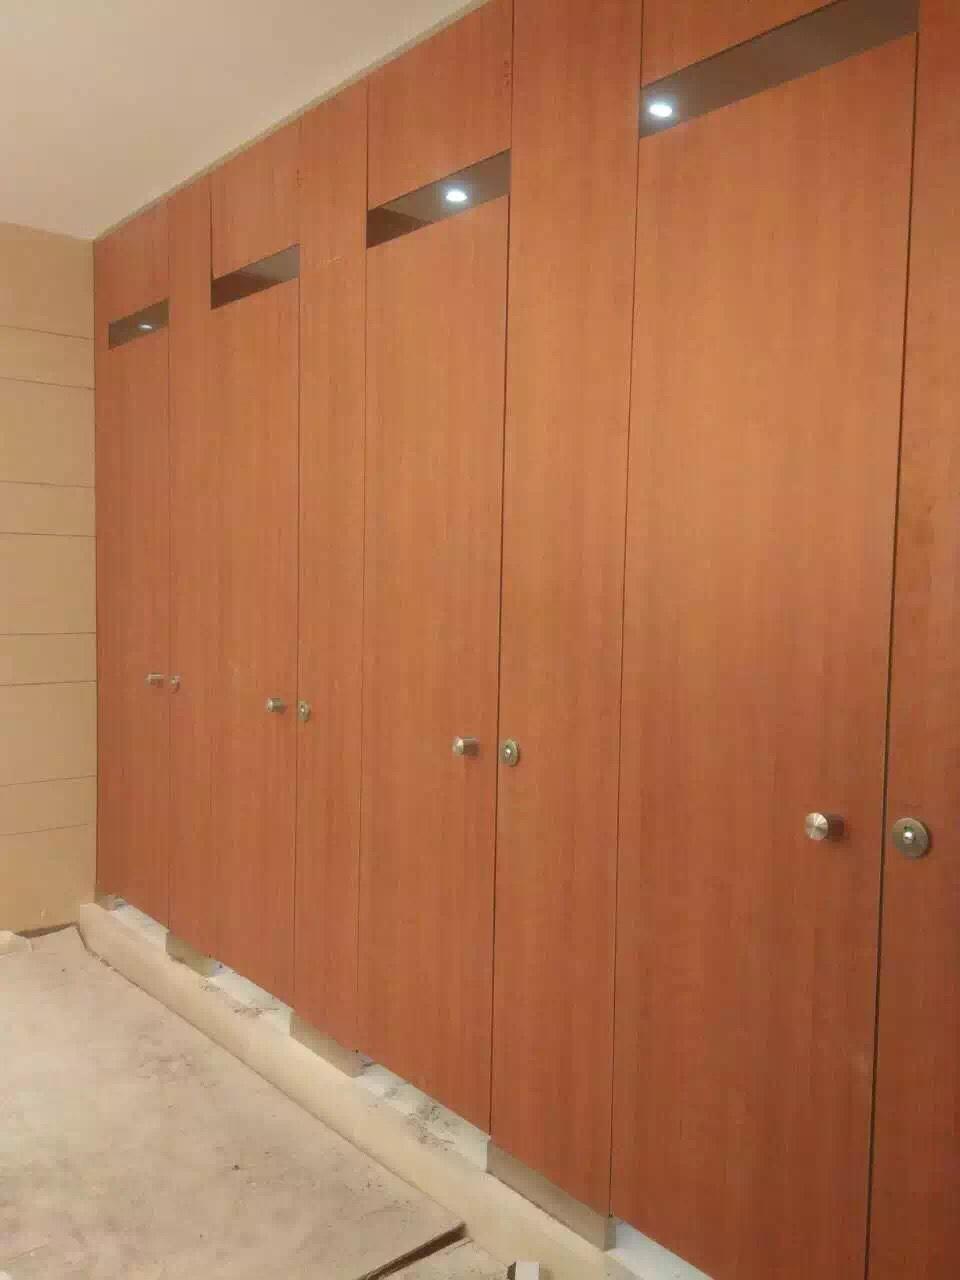 hpl toilet cubicles system